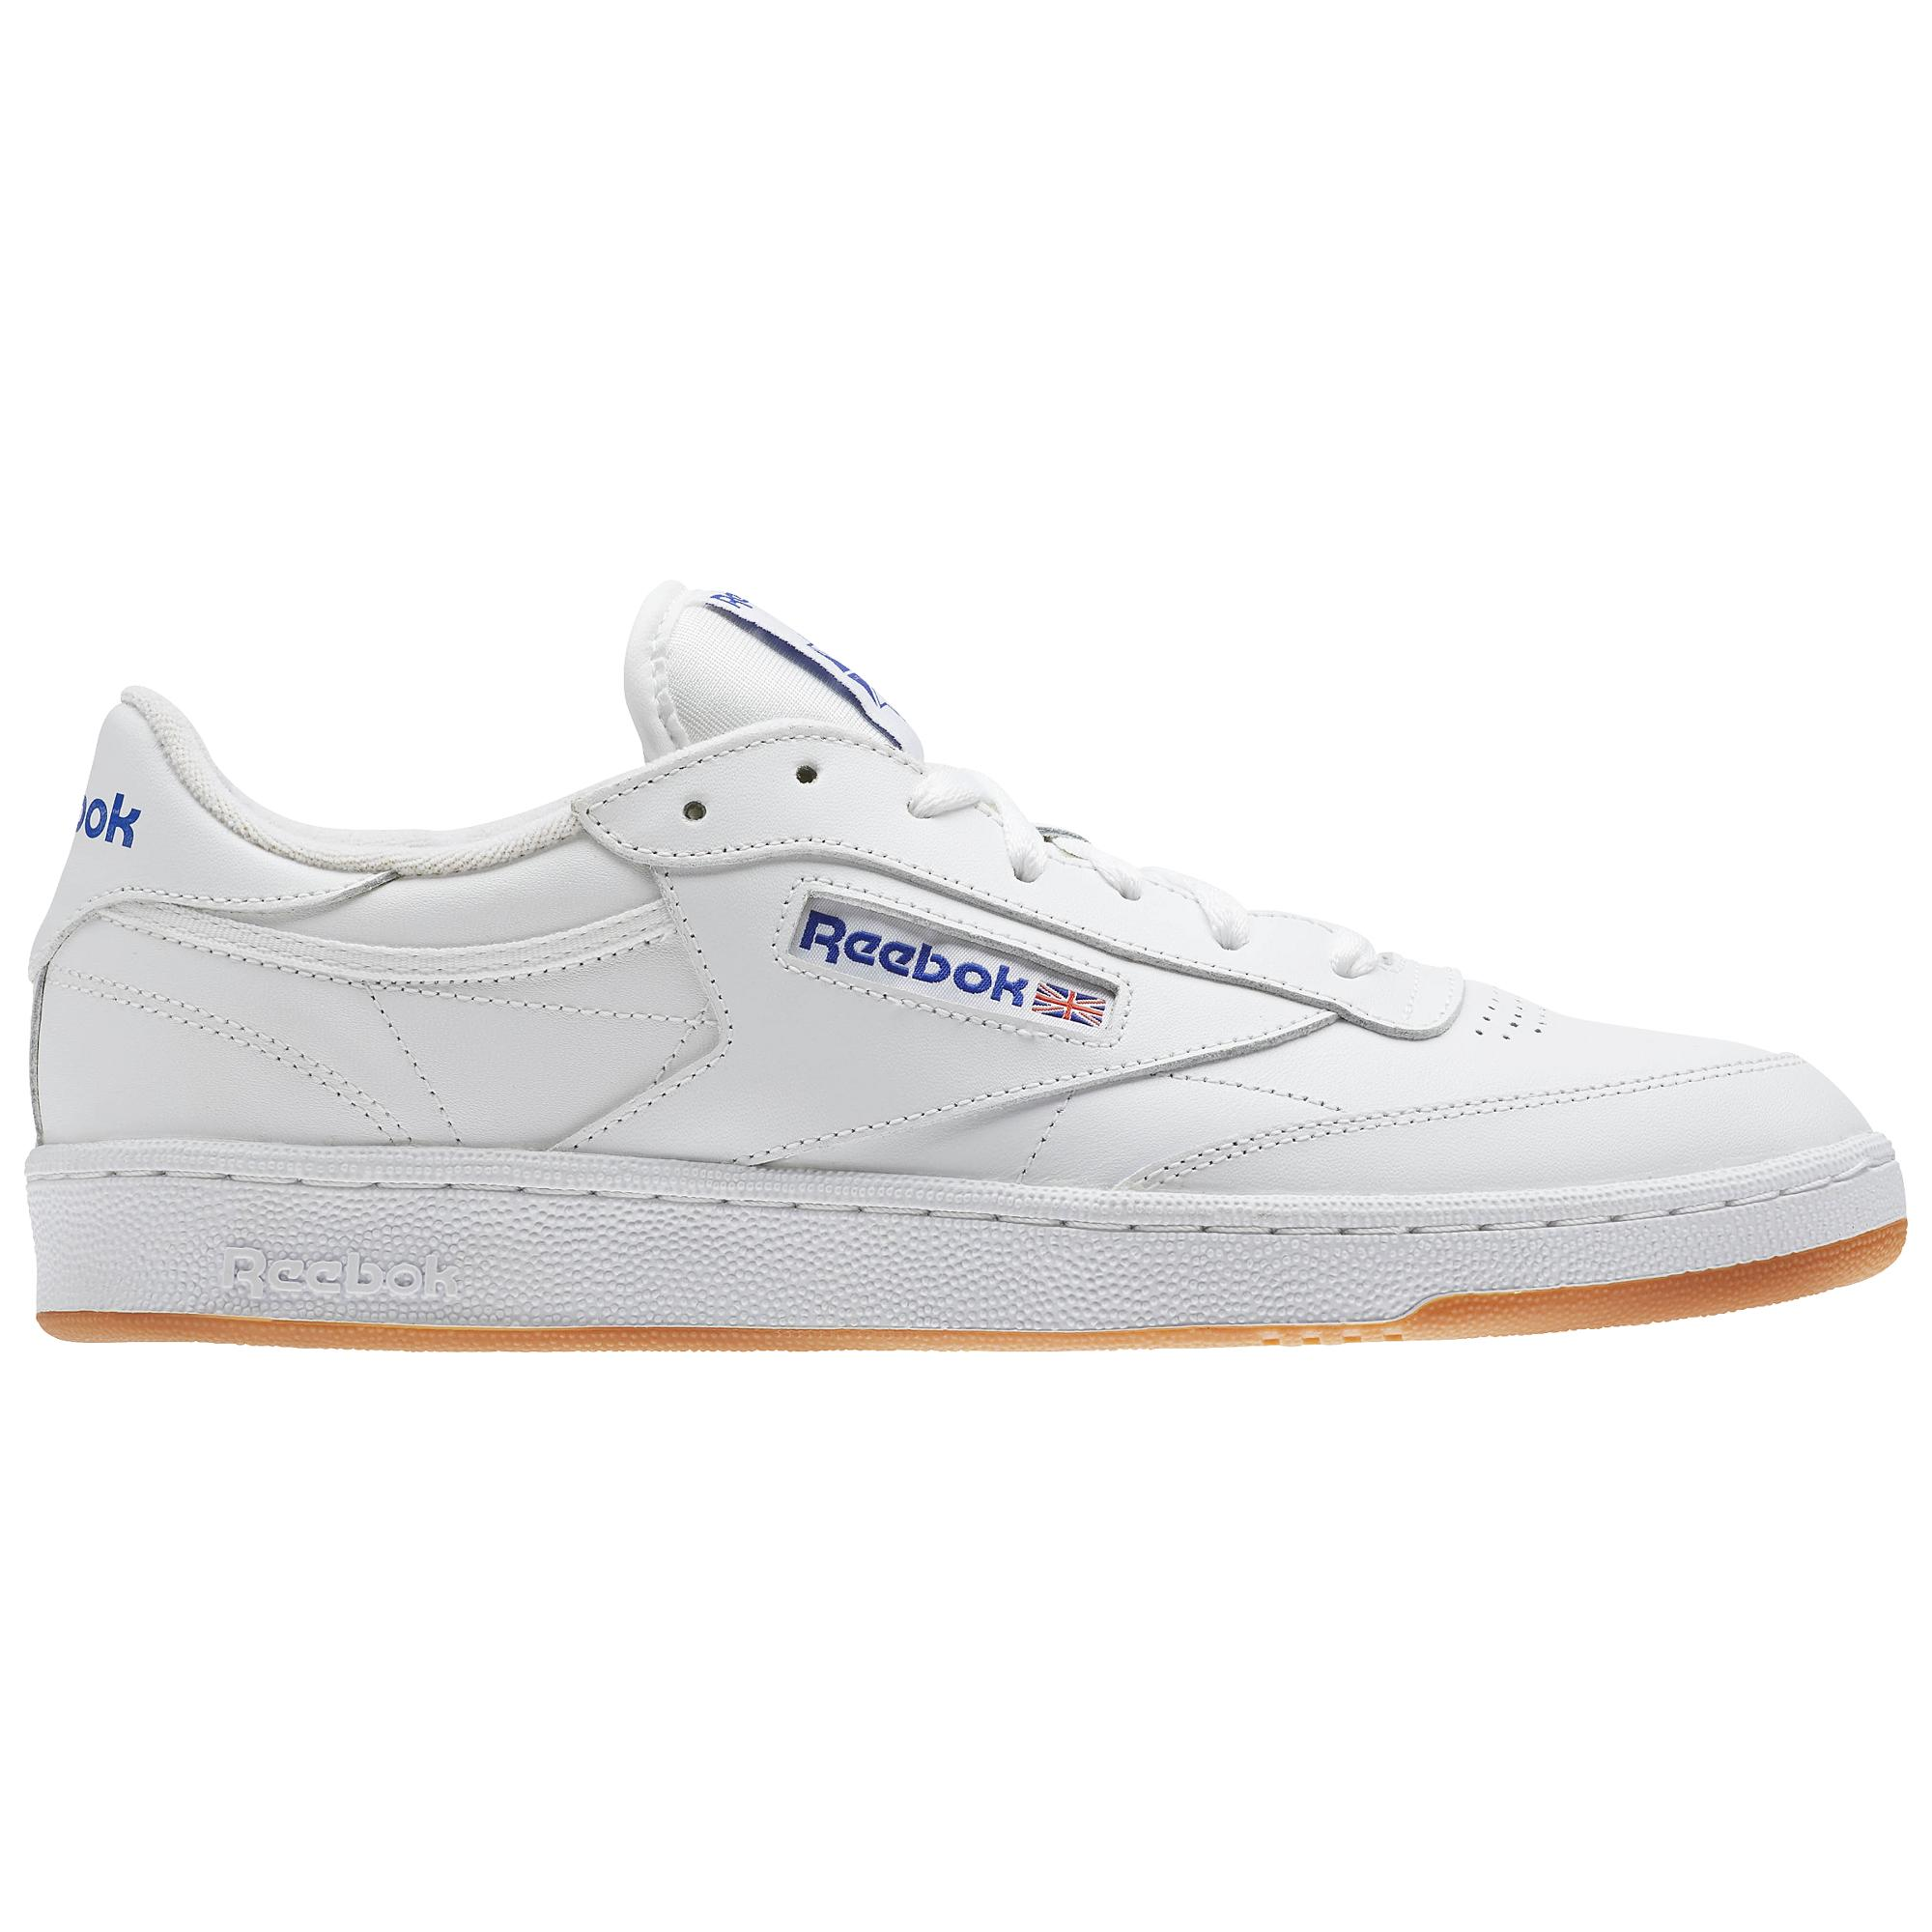 5b749043e9a62e Reebok Shoes Club C 85 Intense White royal-gum - Tifoshop.com